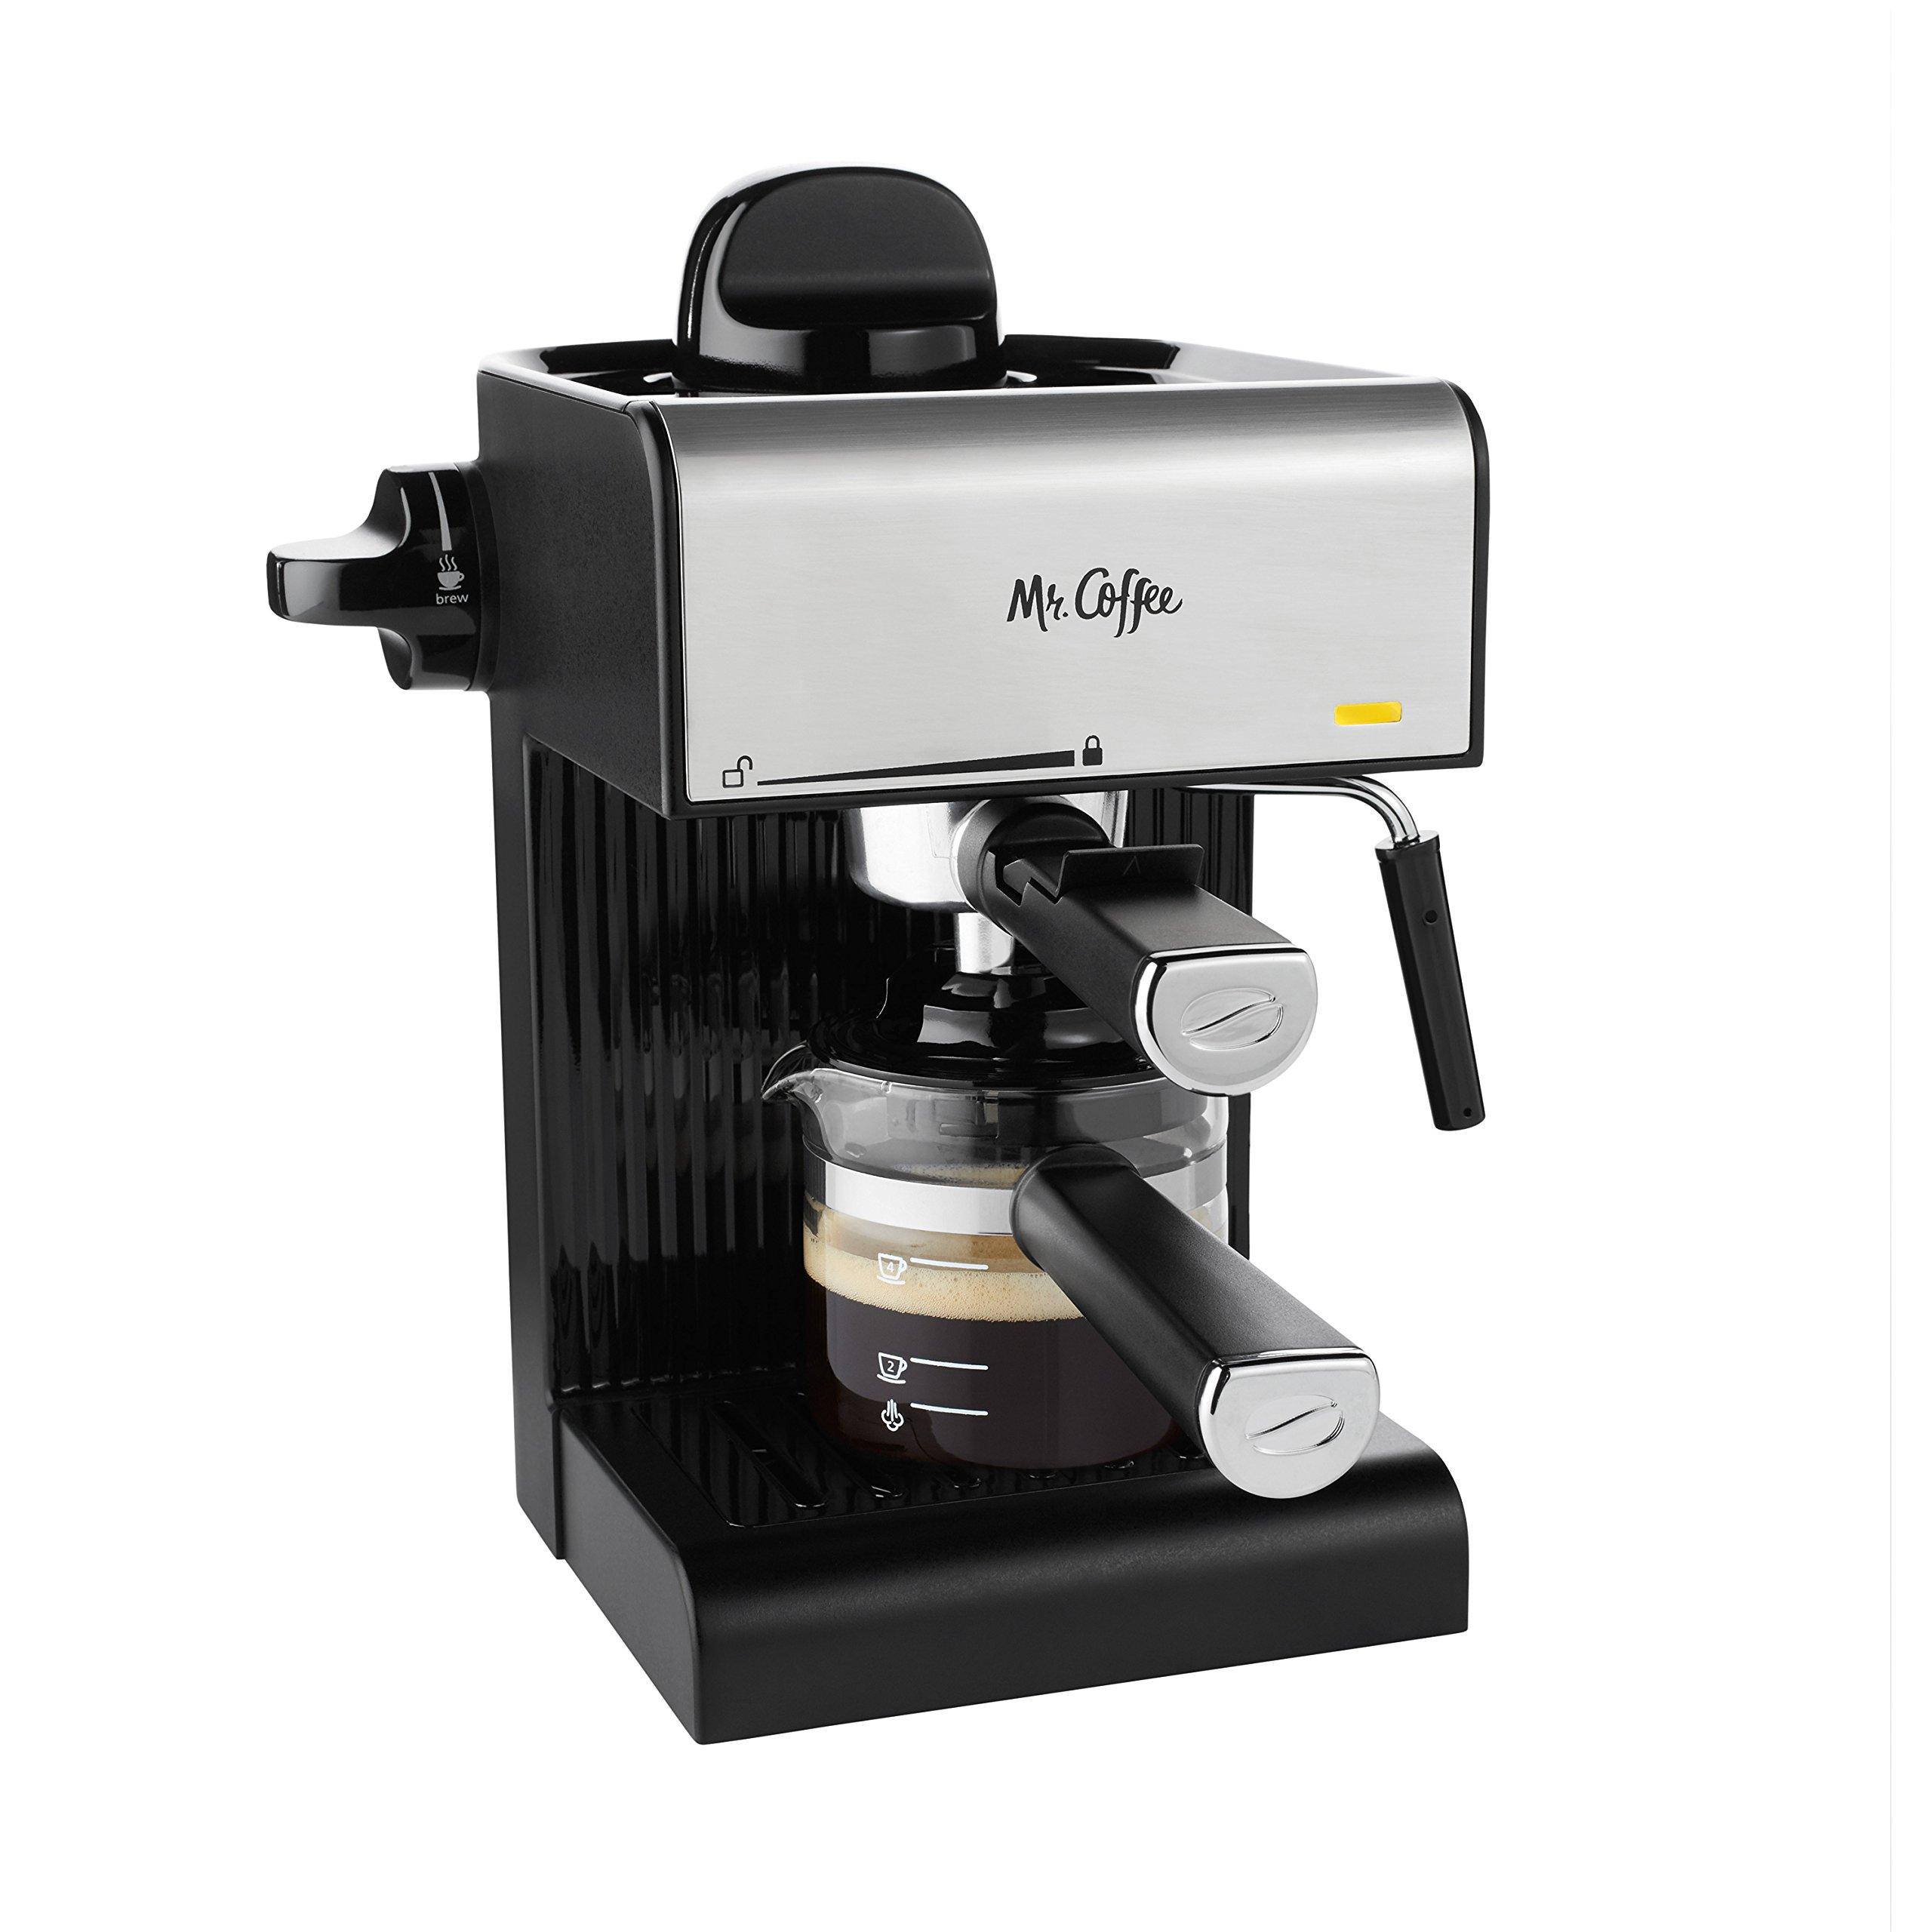 Mr. Coffee BVMC-ECM180 Steam Espresso with Starter Set, Black by Mr. Coffee